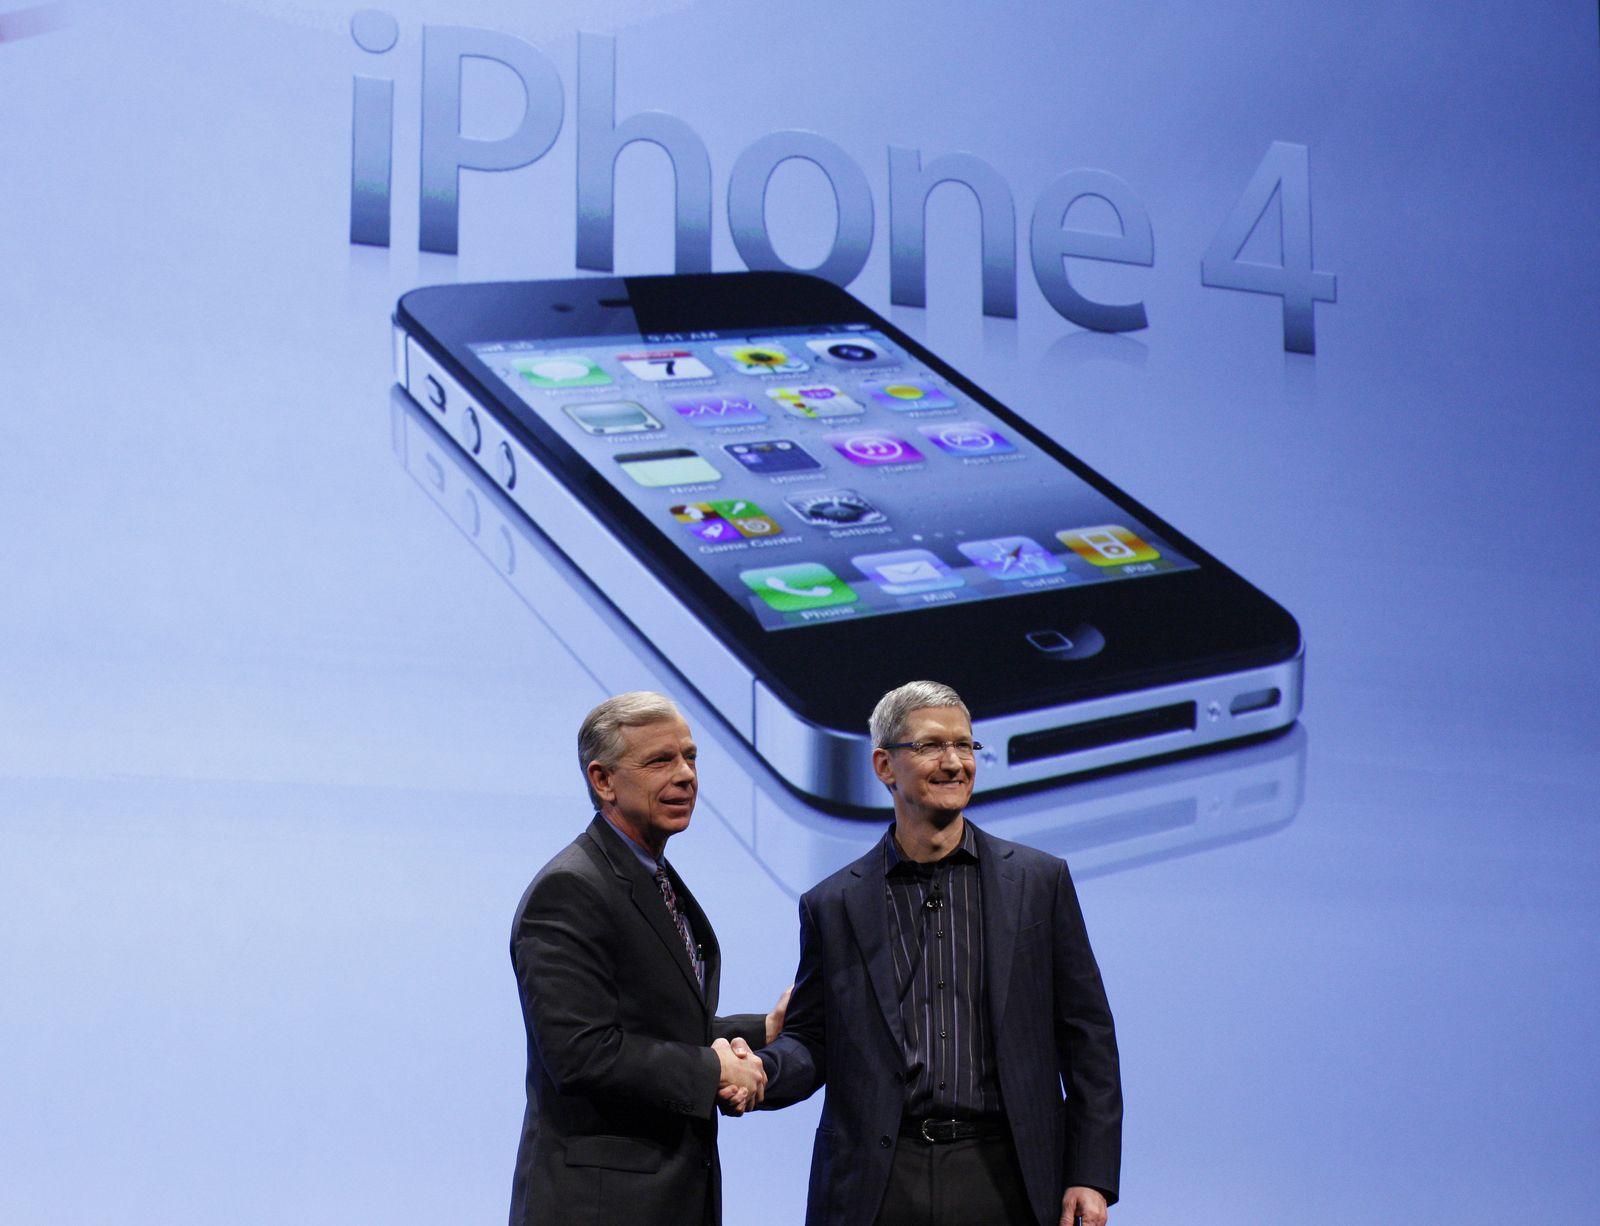 Tim Cook / Apple smiling